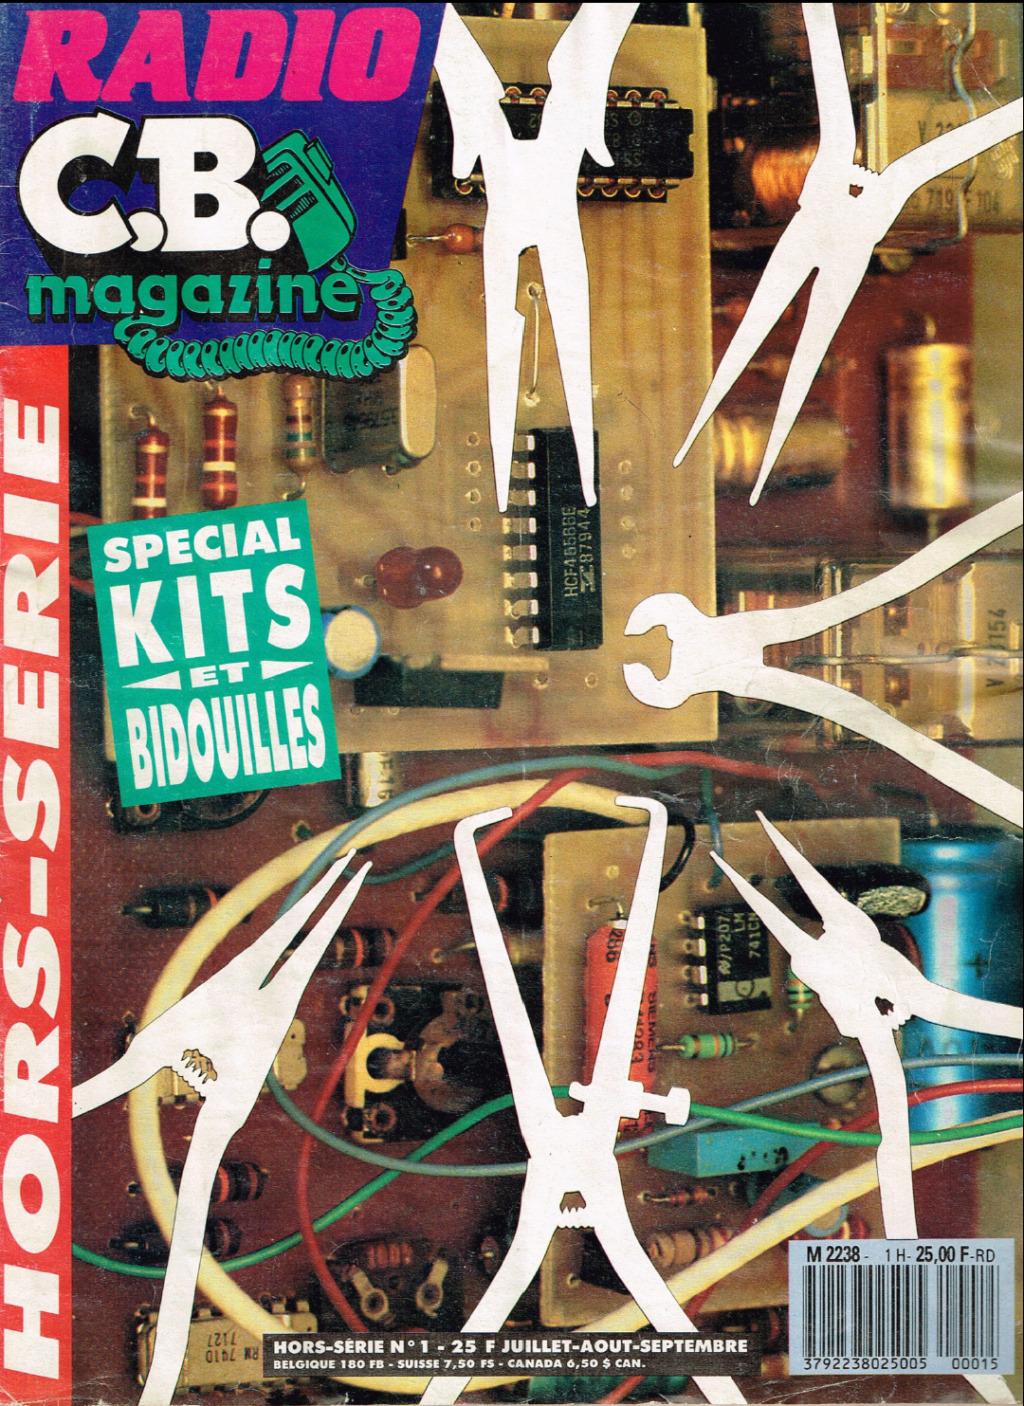 C.B. Magazine - Radio C.B. Magazine (Magazine (Fr.) - Page 12 Captu280